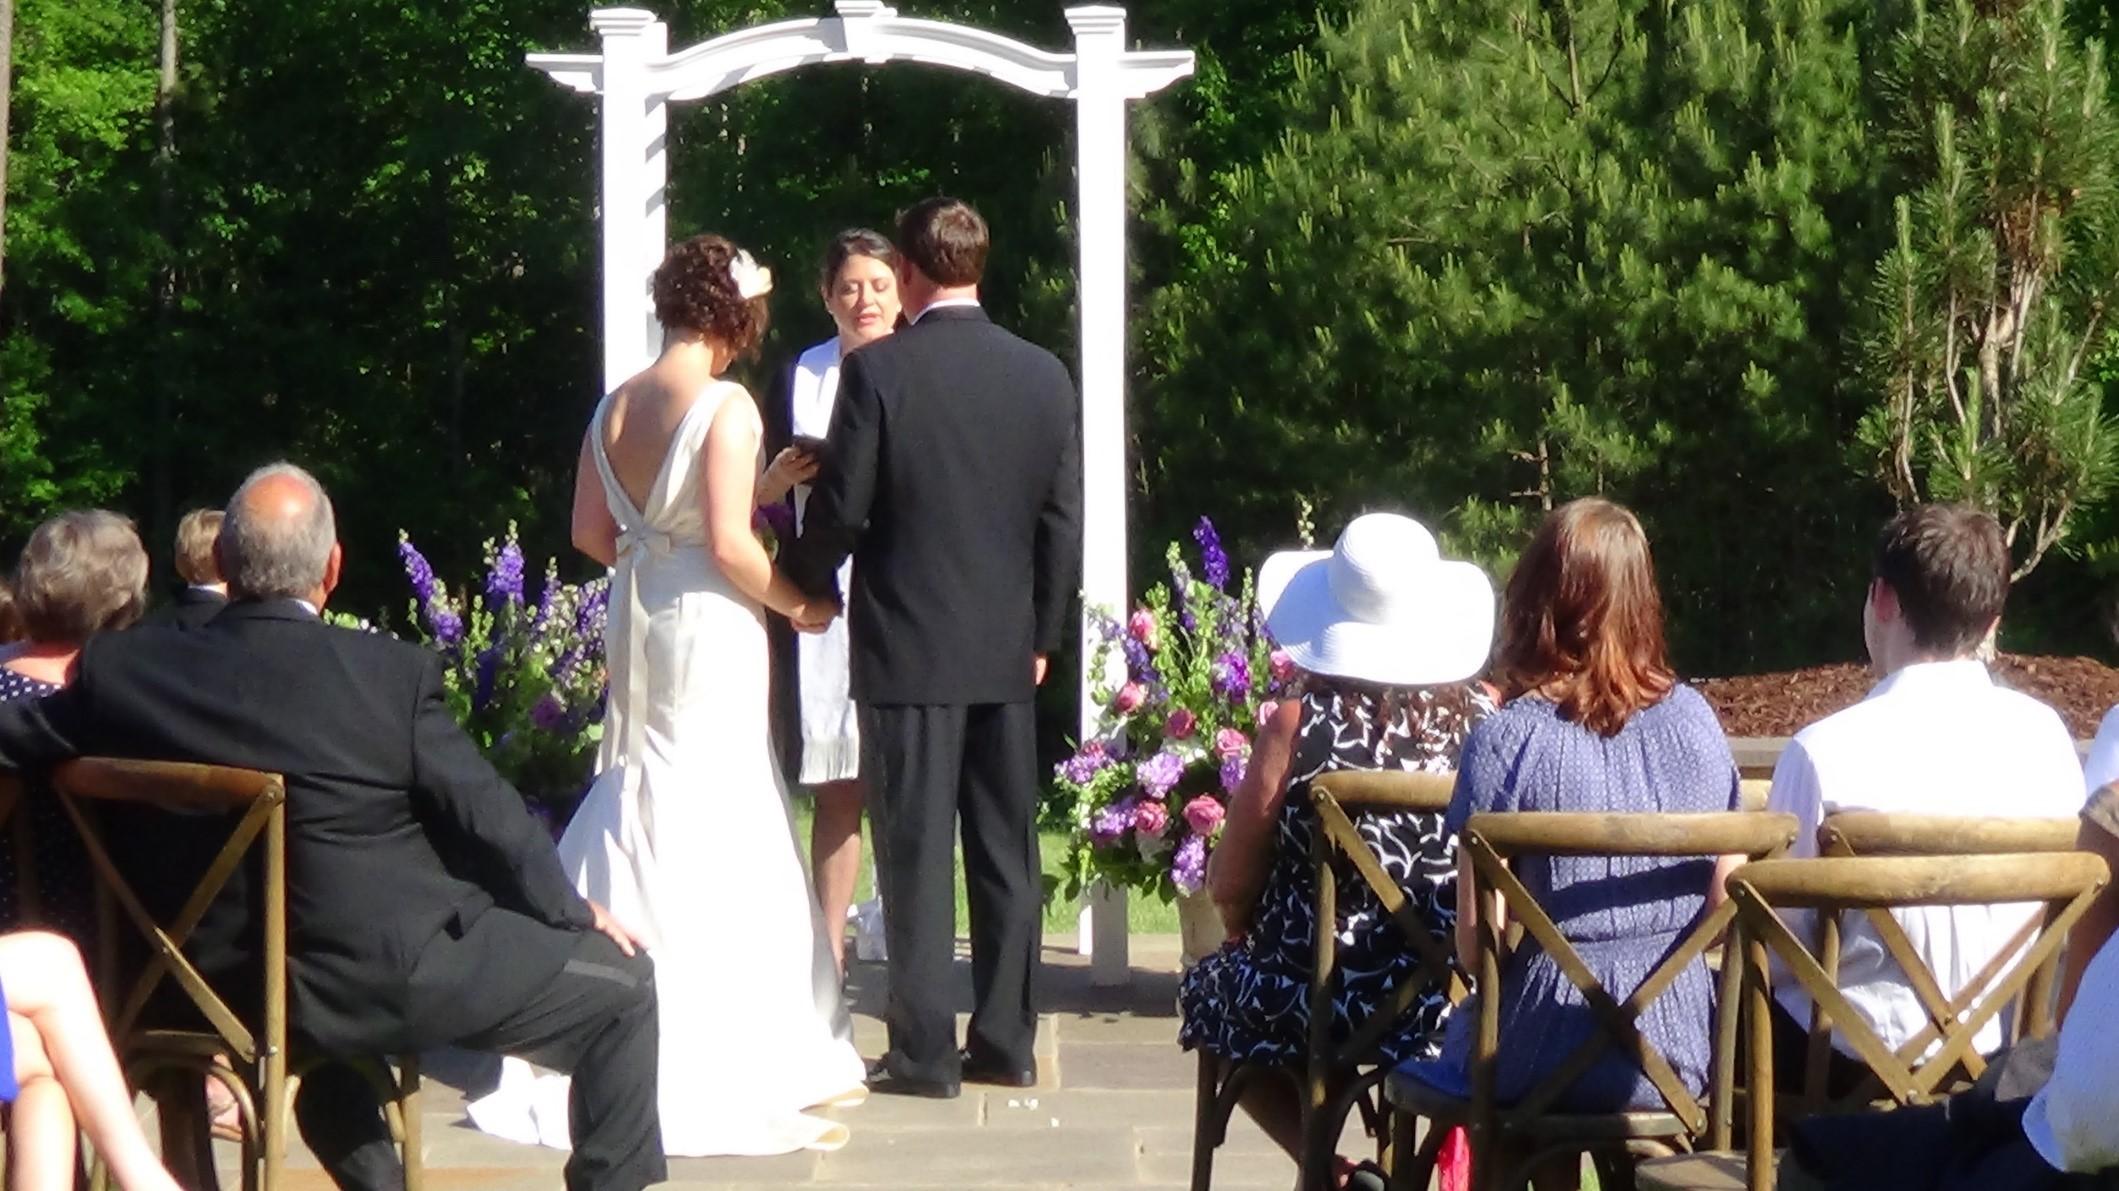 A bilingual wedding ceremony